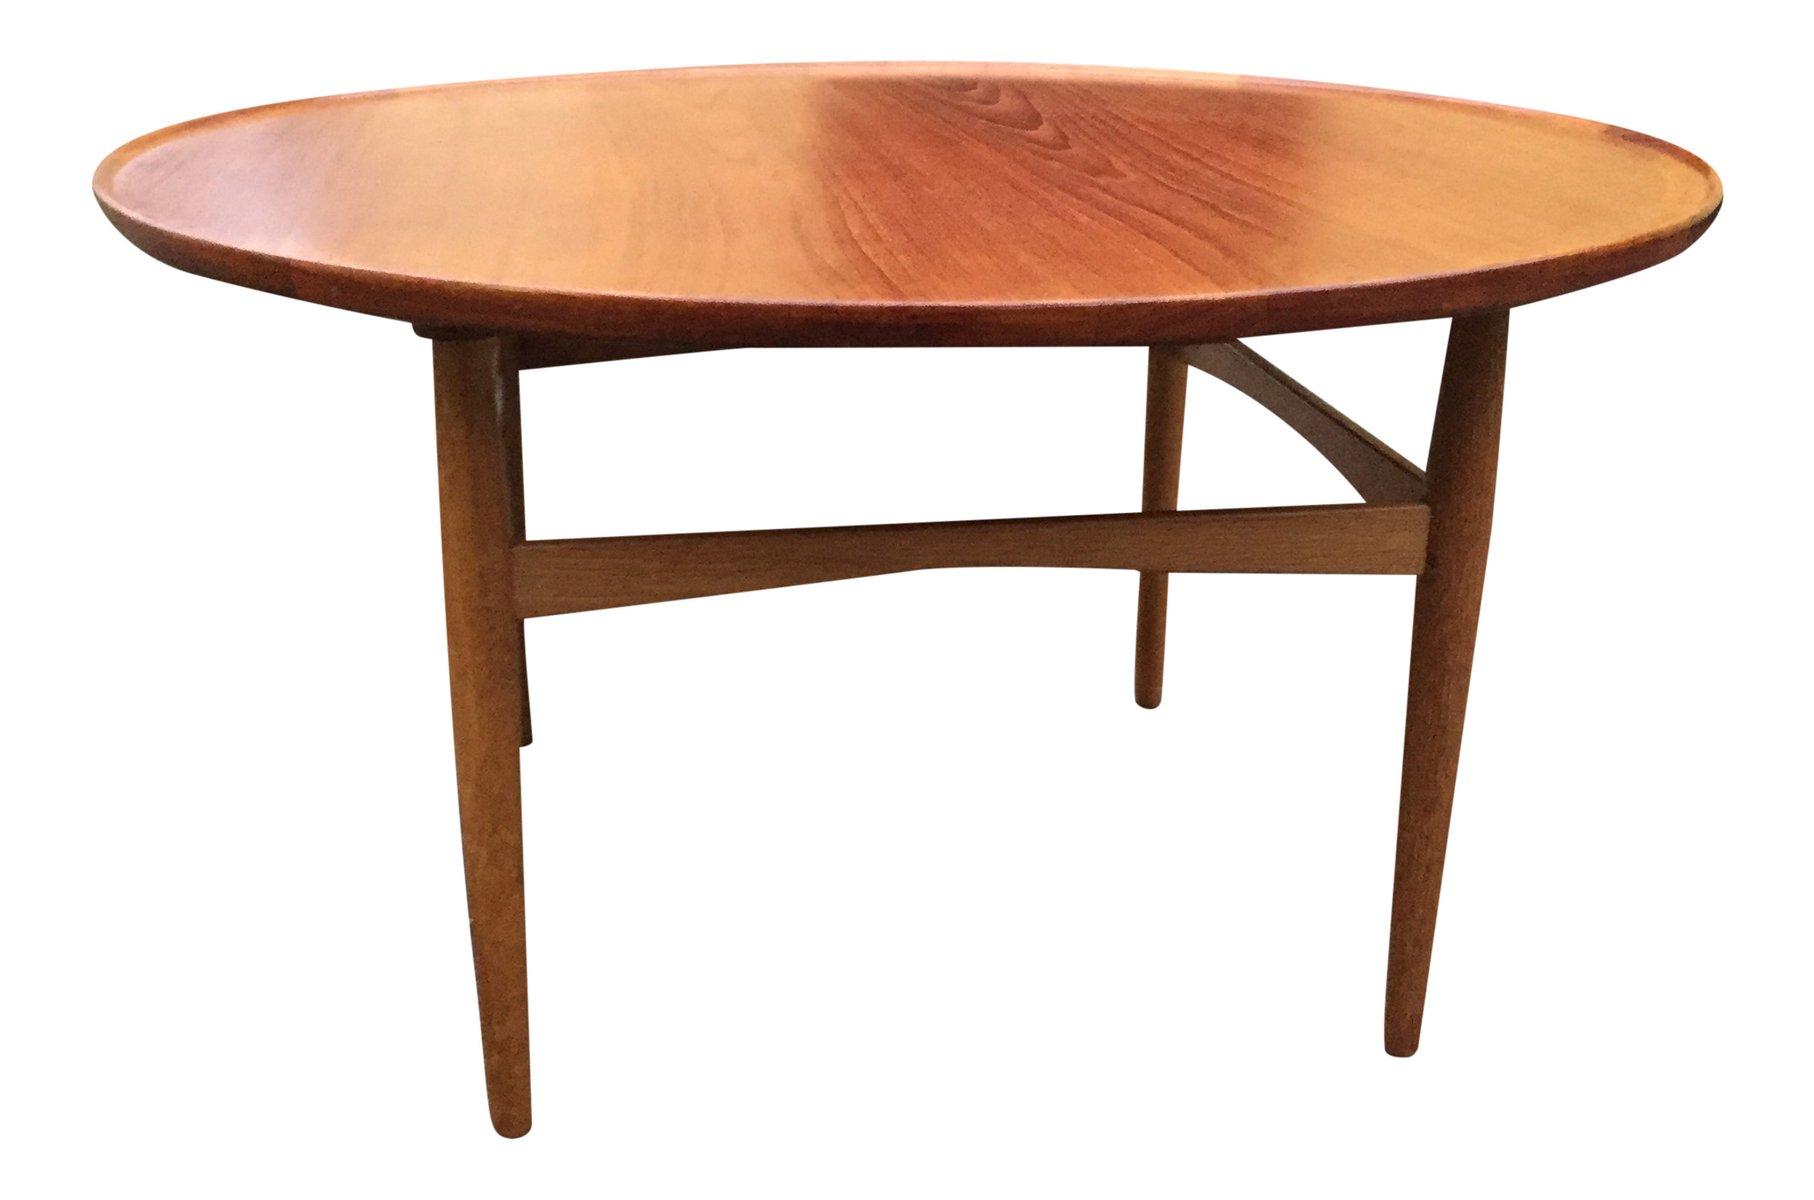 Round Danish Teak & Oak Coffee Table 1960s for sale at Pamono